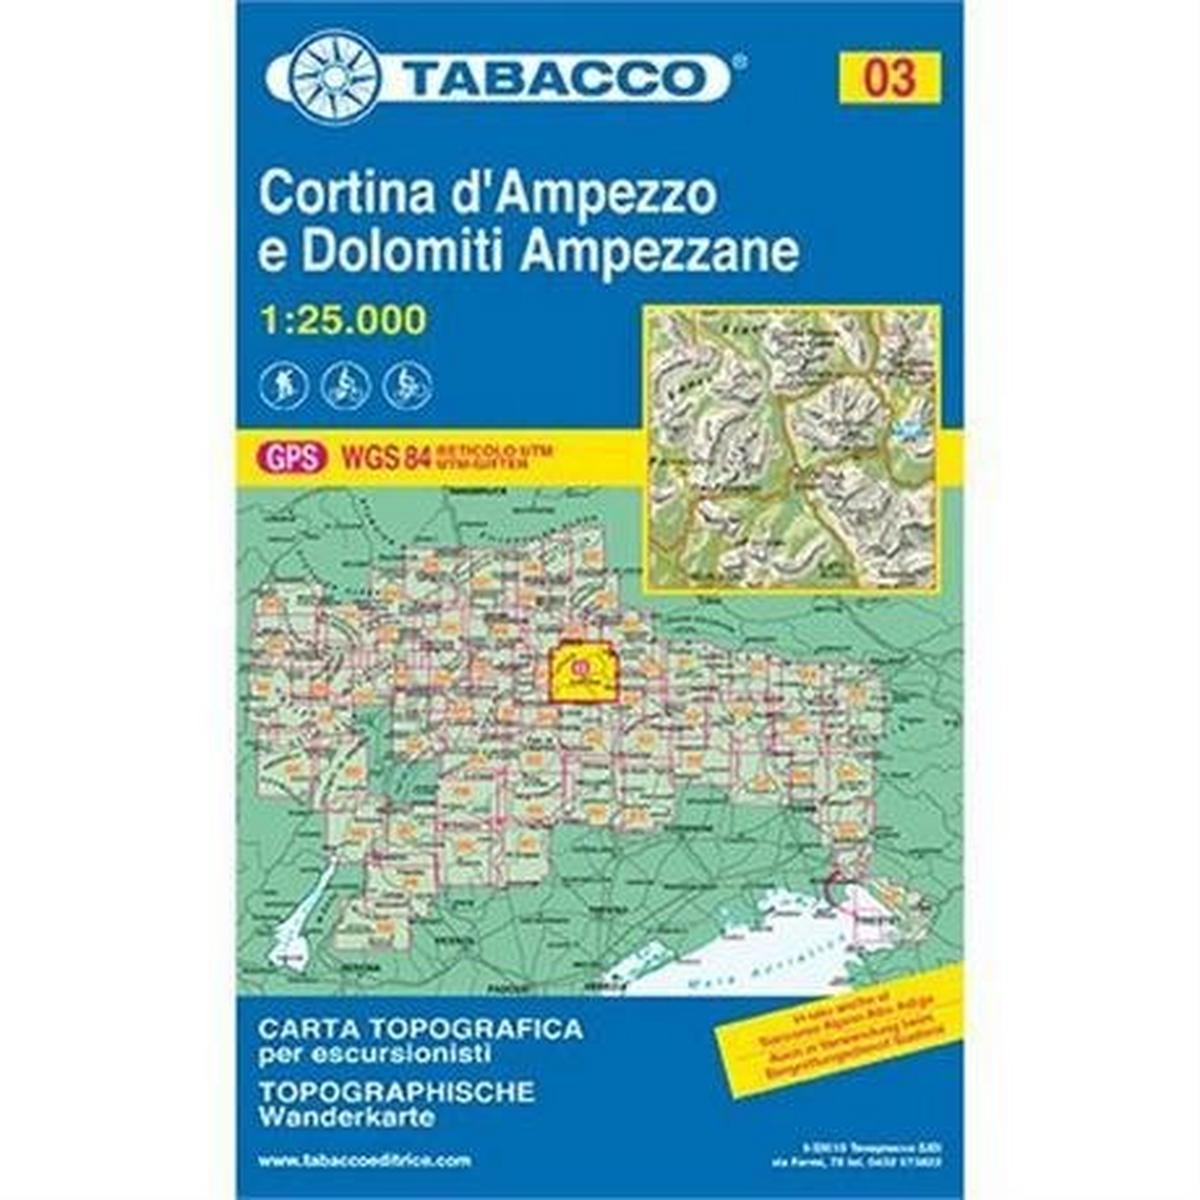 Miscellaneous Italy Tabacco Map 03: Cortina d'Ampezzo